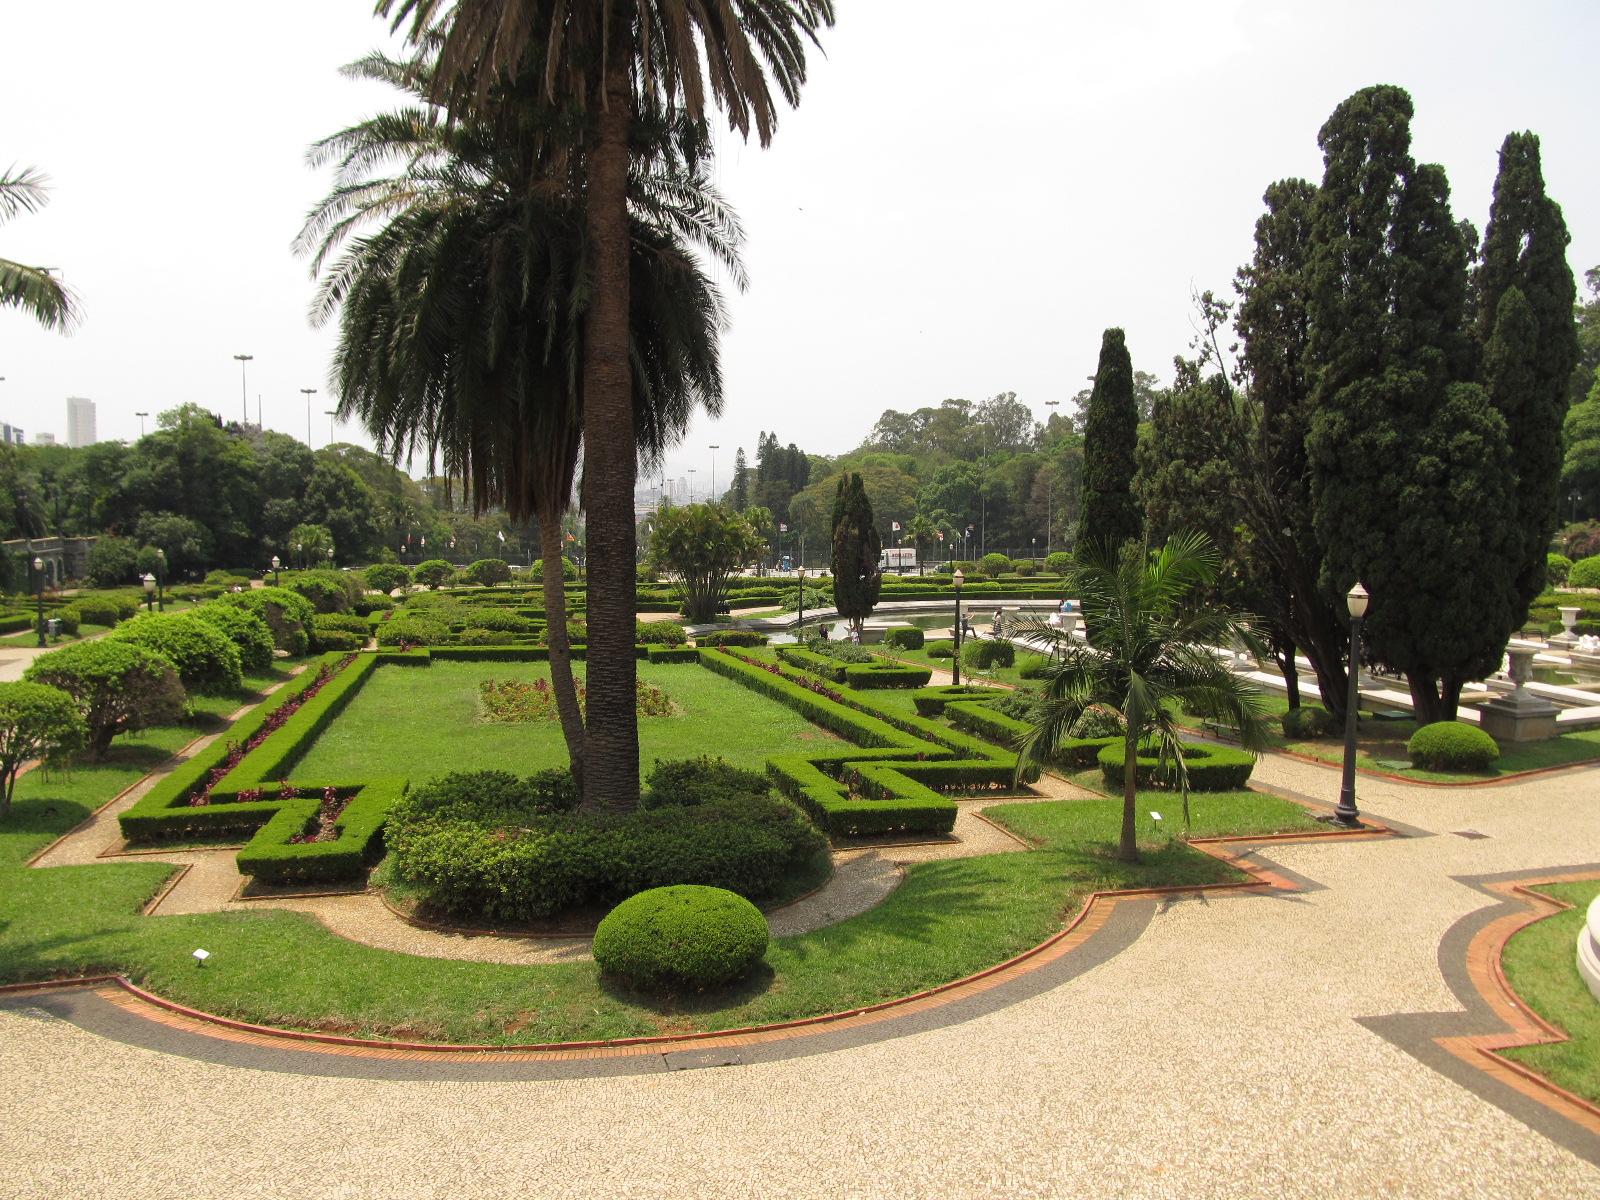 Paulista_Museum_gardens_in_Sao_Paulo,_Br